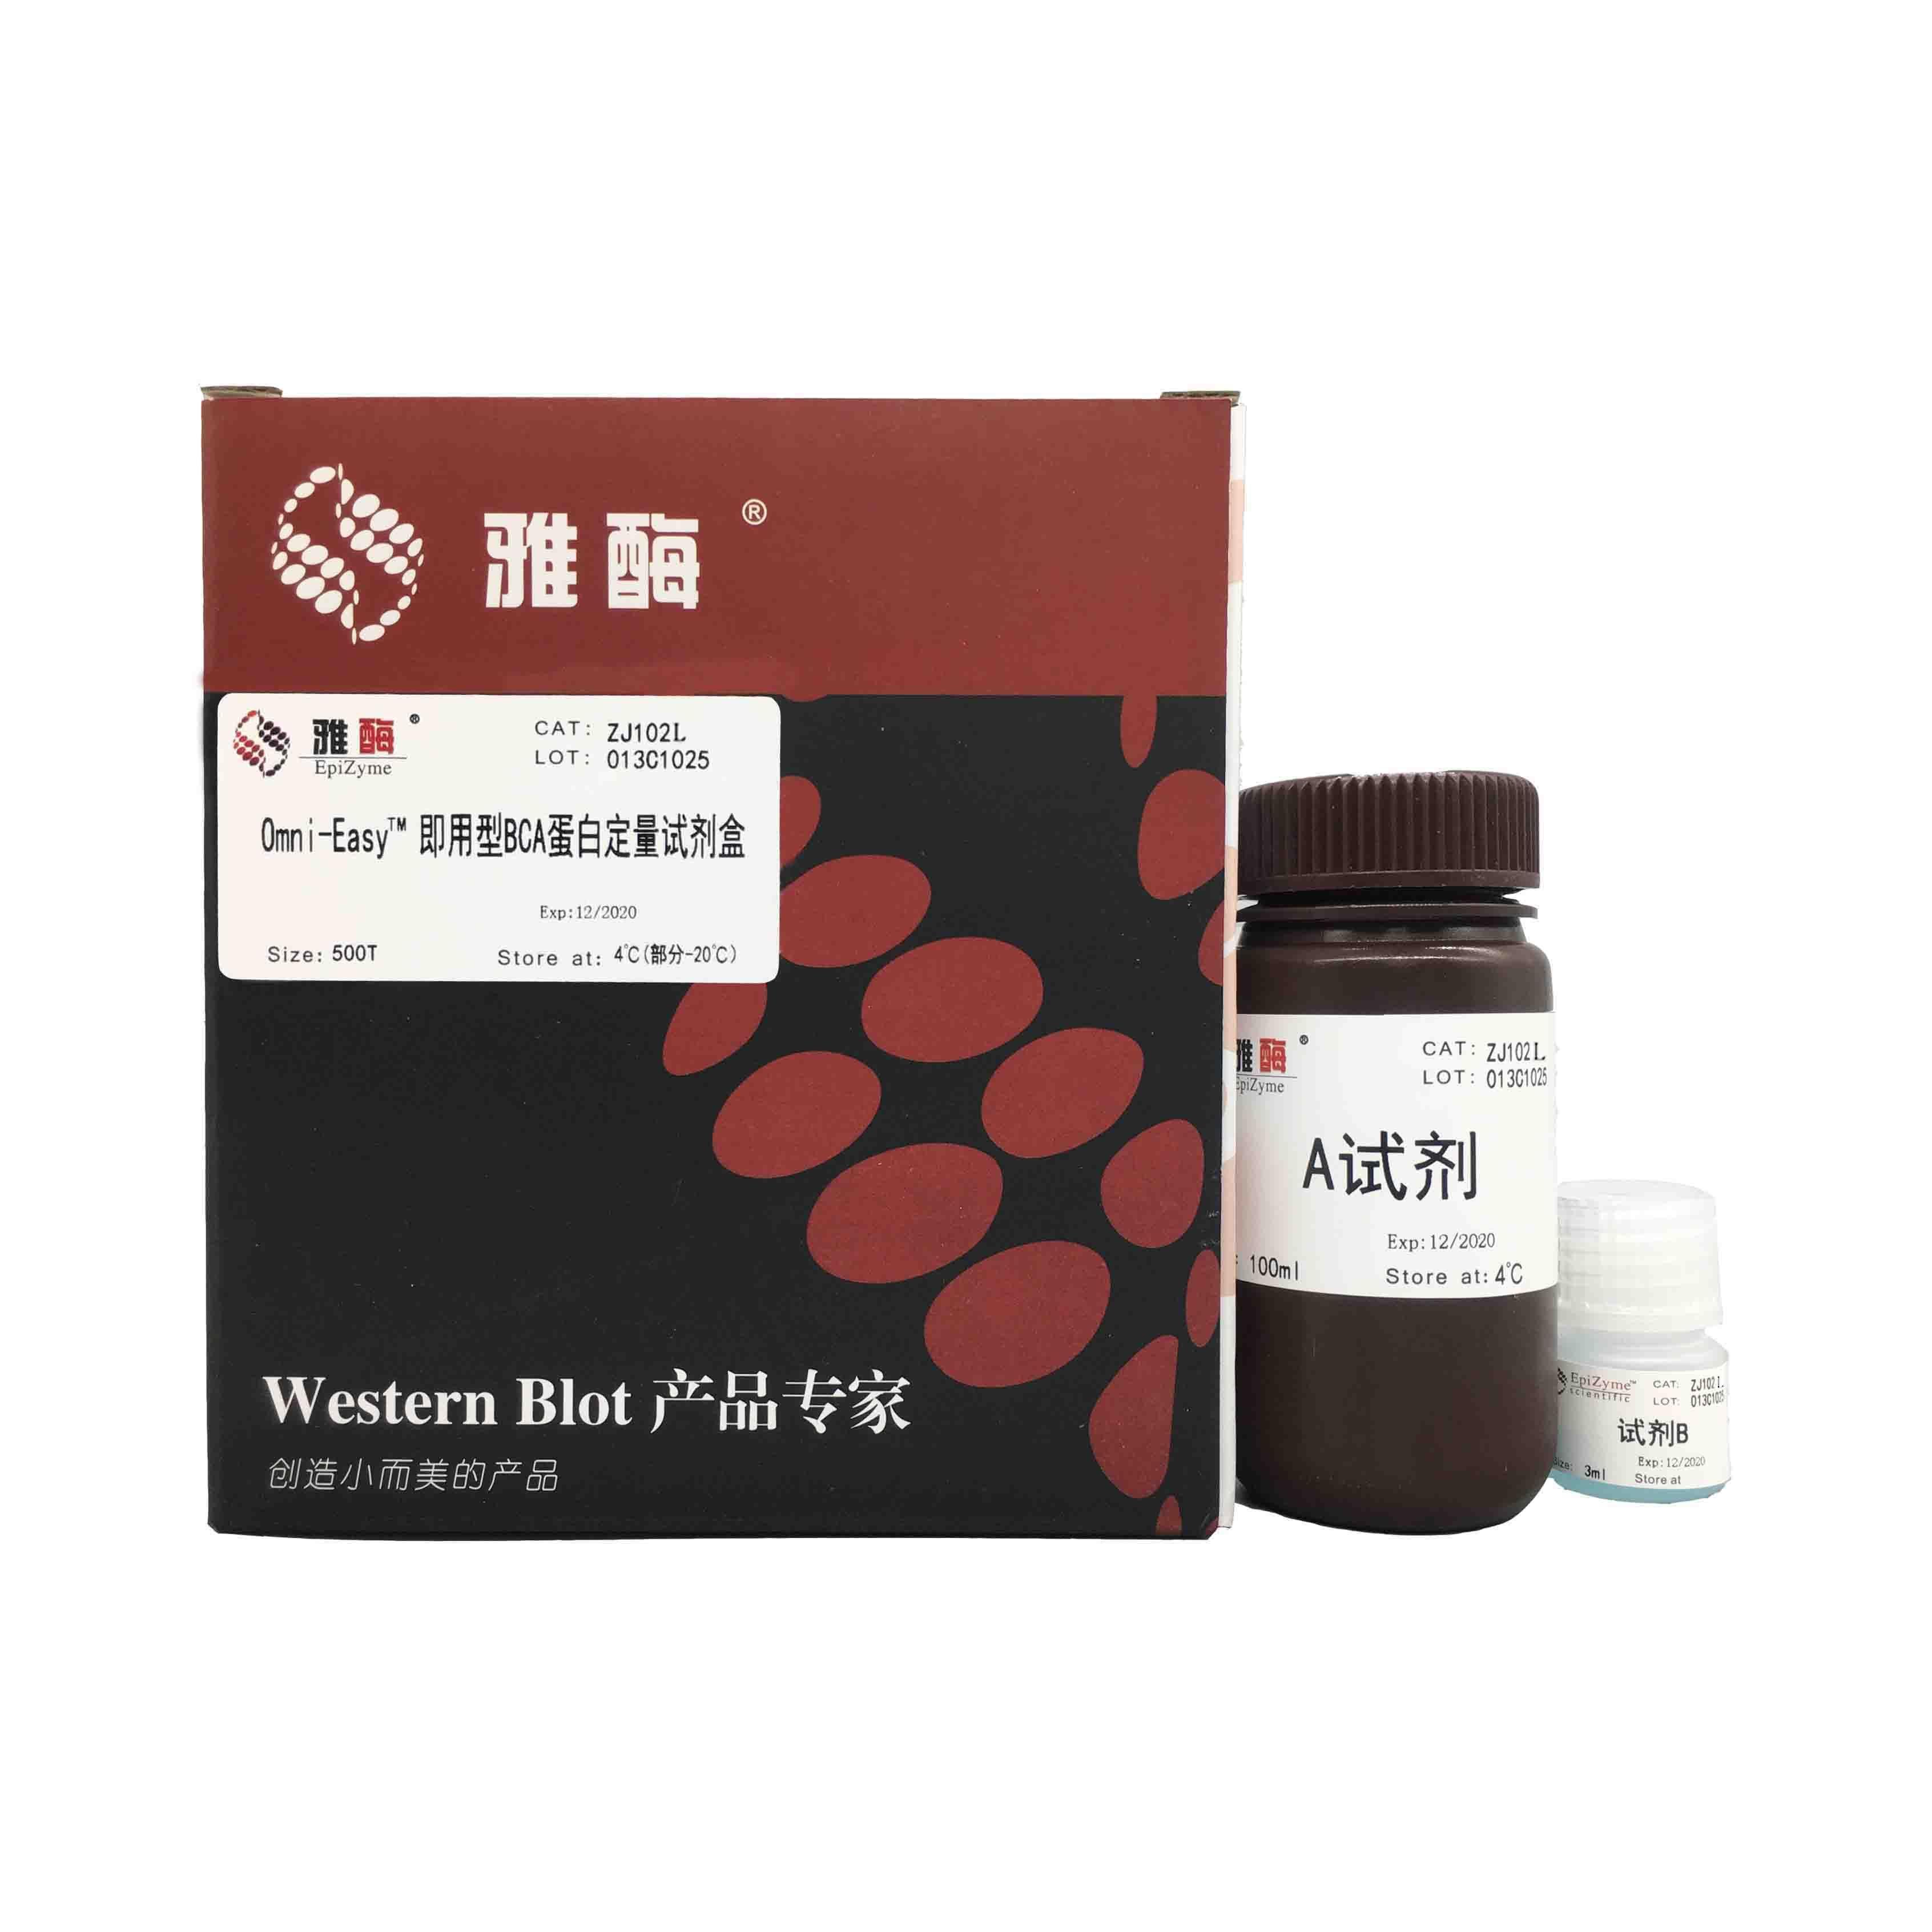 ZJ102L Omni-Easy™即用型BCA蛋白定量试剂盒